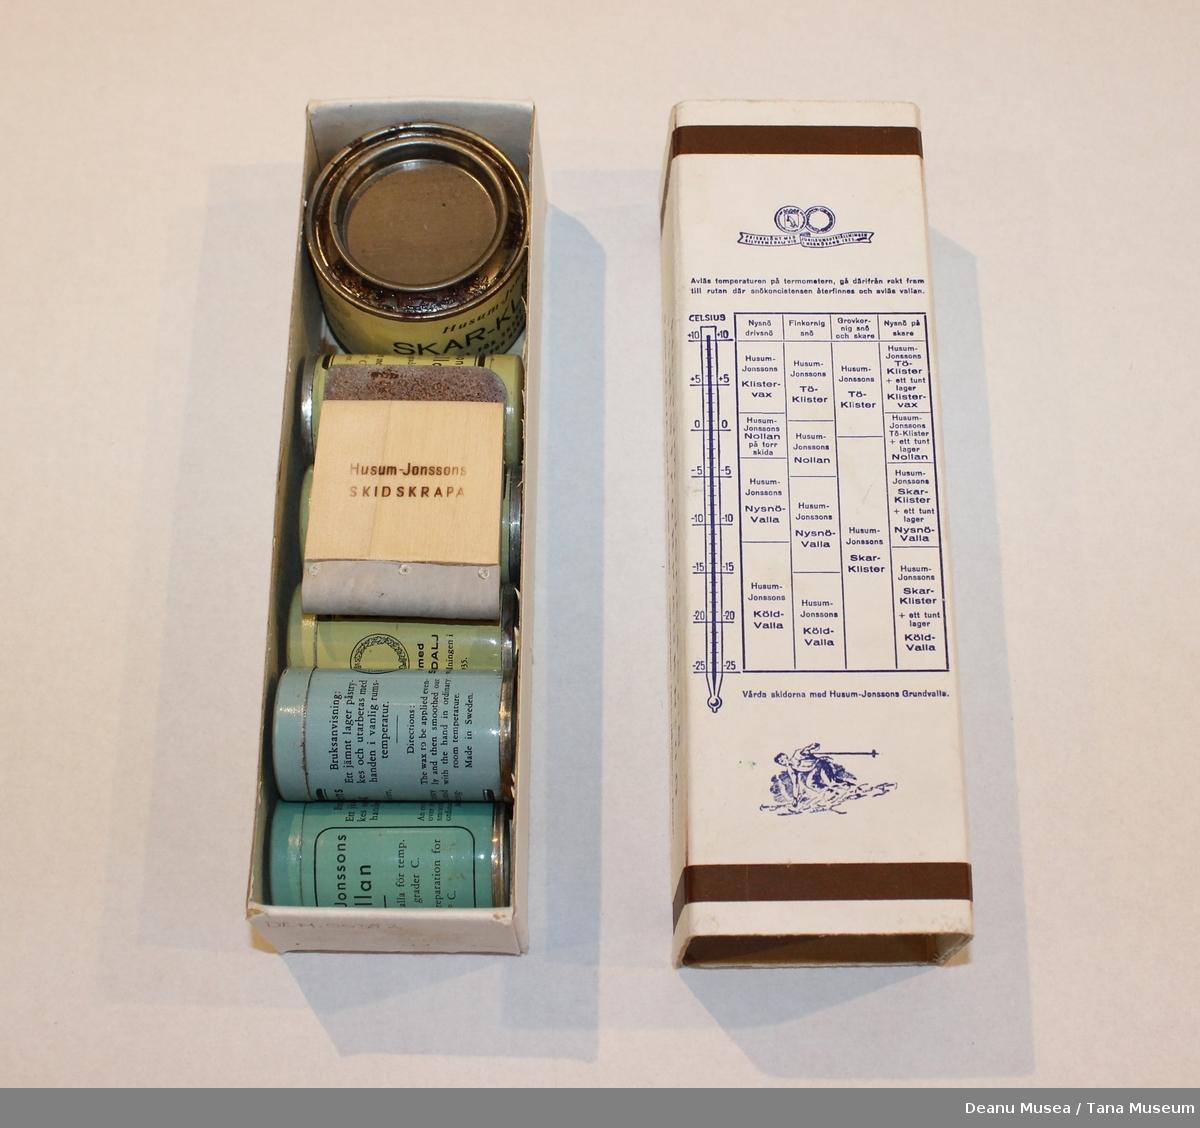 Pakke med Husum - Jonssons Turistforpackning, skismurning 5 stk skivoks fra 0 C til 12 C. 1 stk tjære Skar-klister. 1 stk skrape.